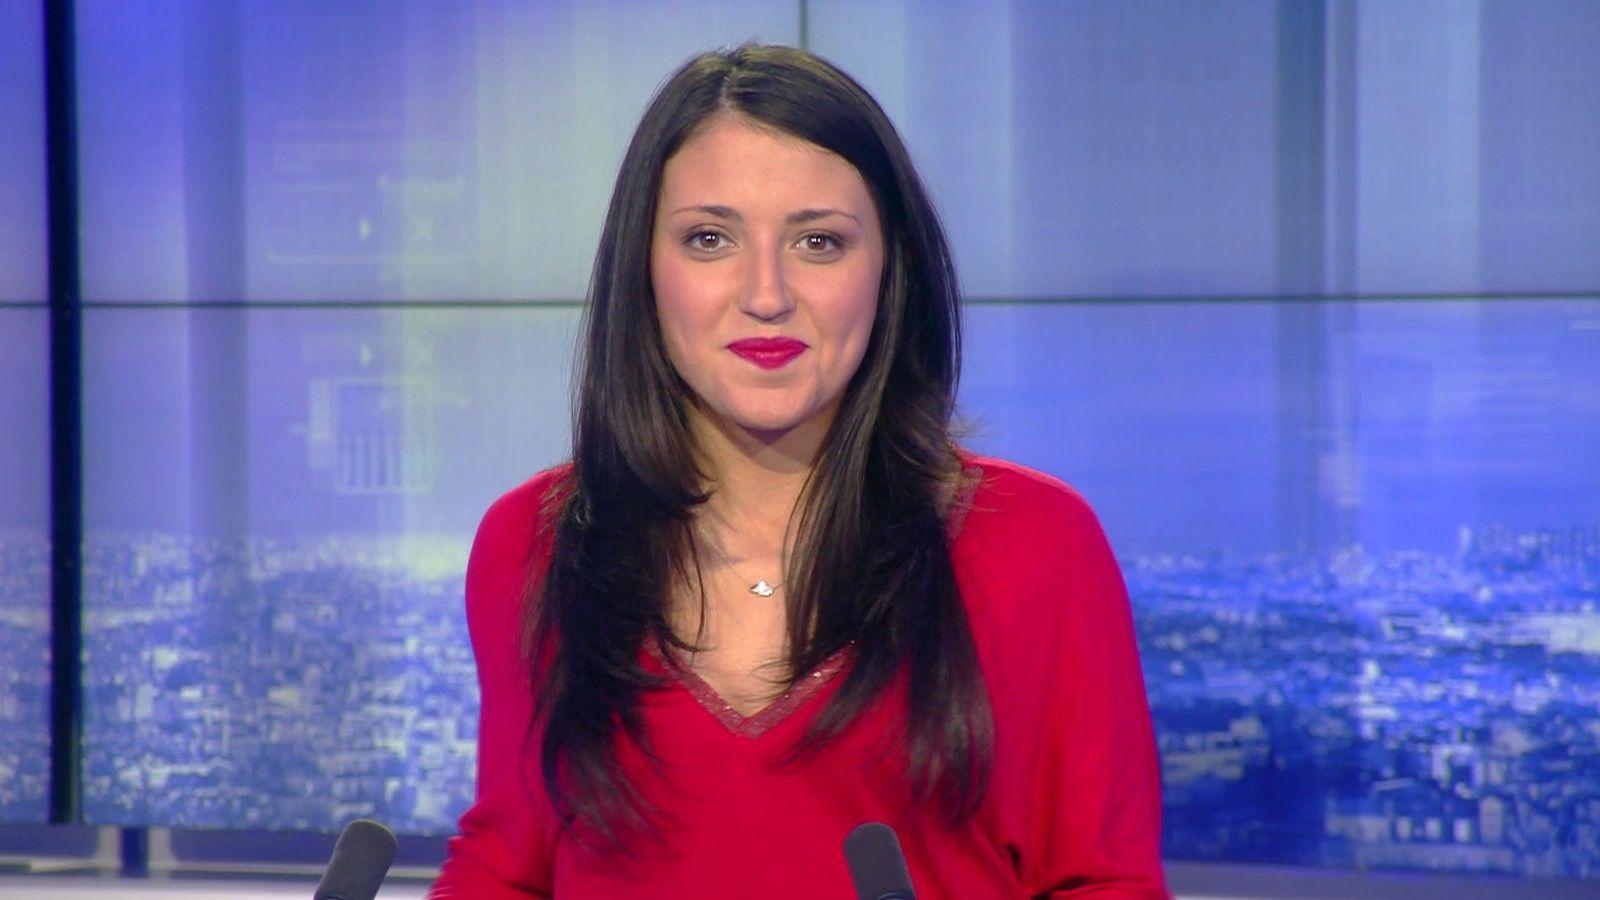 �11 SONIA CARNEIRO ��� @SoniaaCarneiro pour LES SPORTS cette nuit @itele #vuesalatele